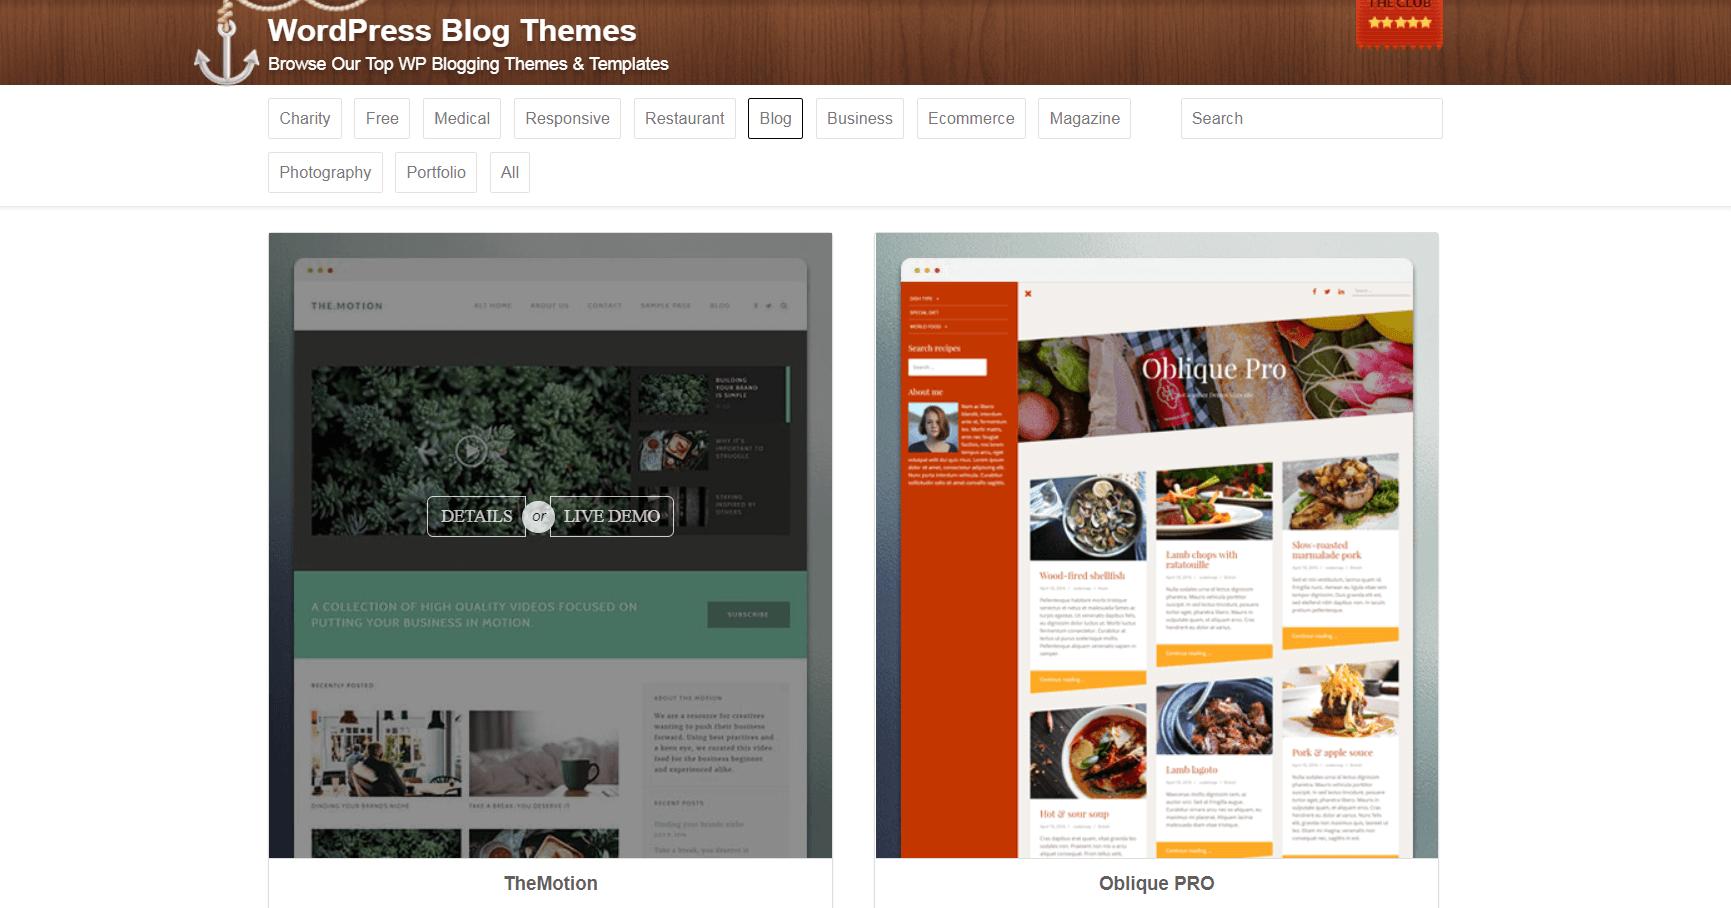 Blog themes on ThemeIsle.